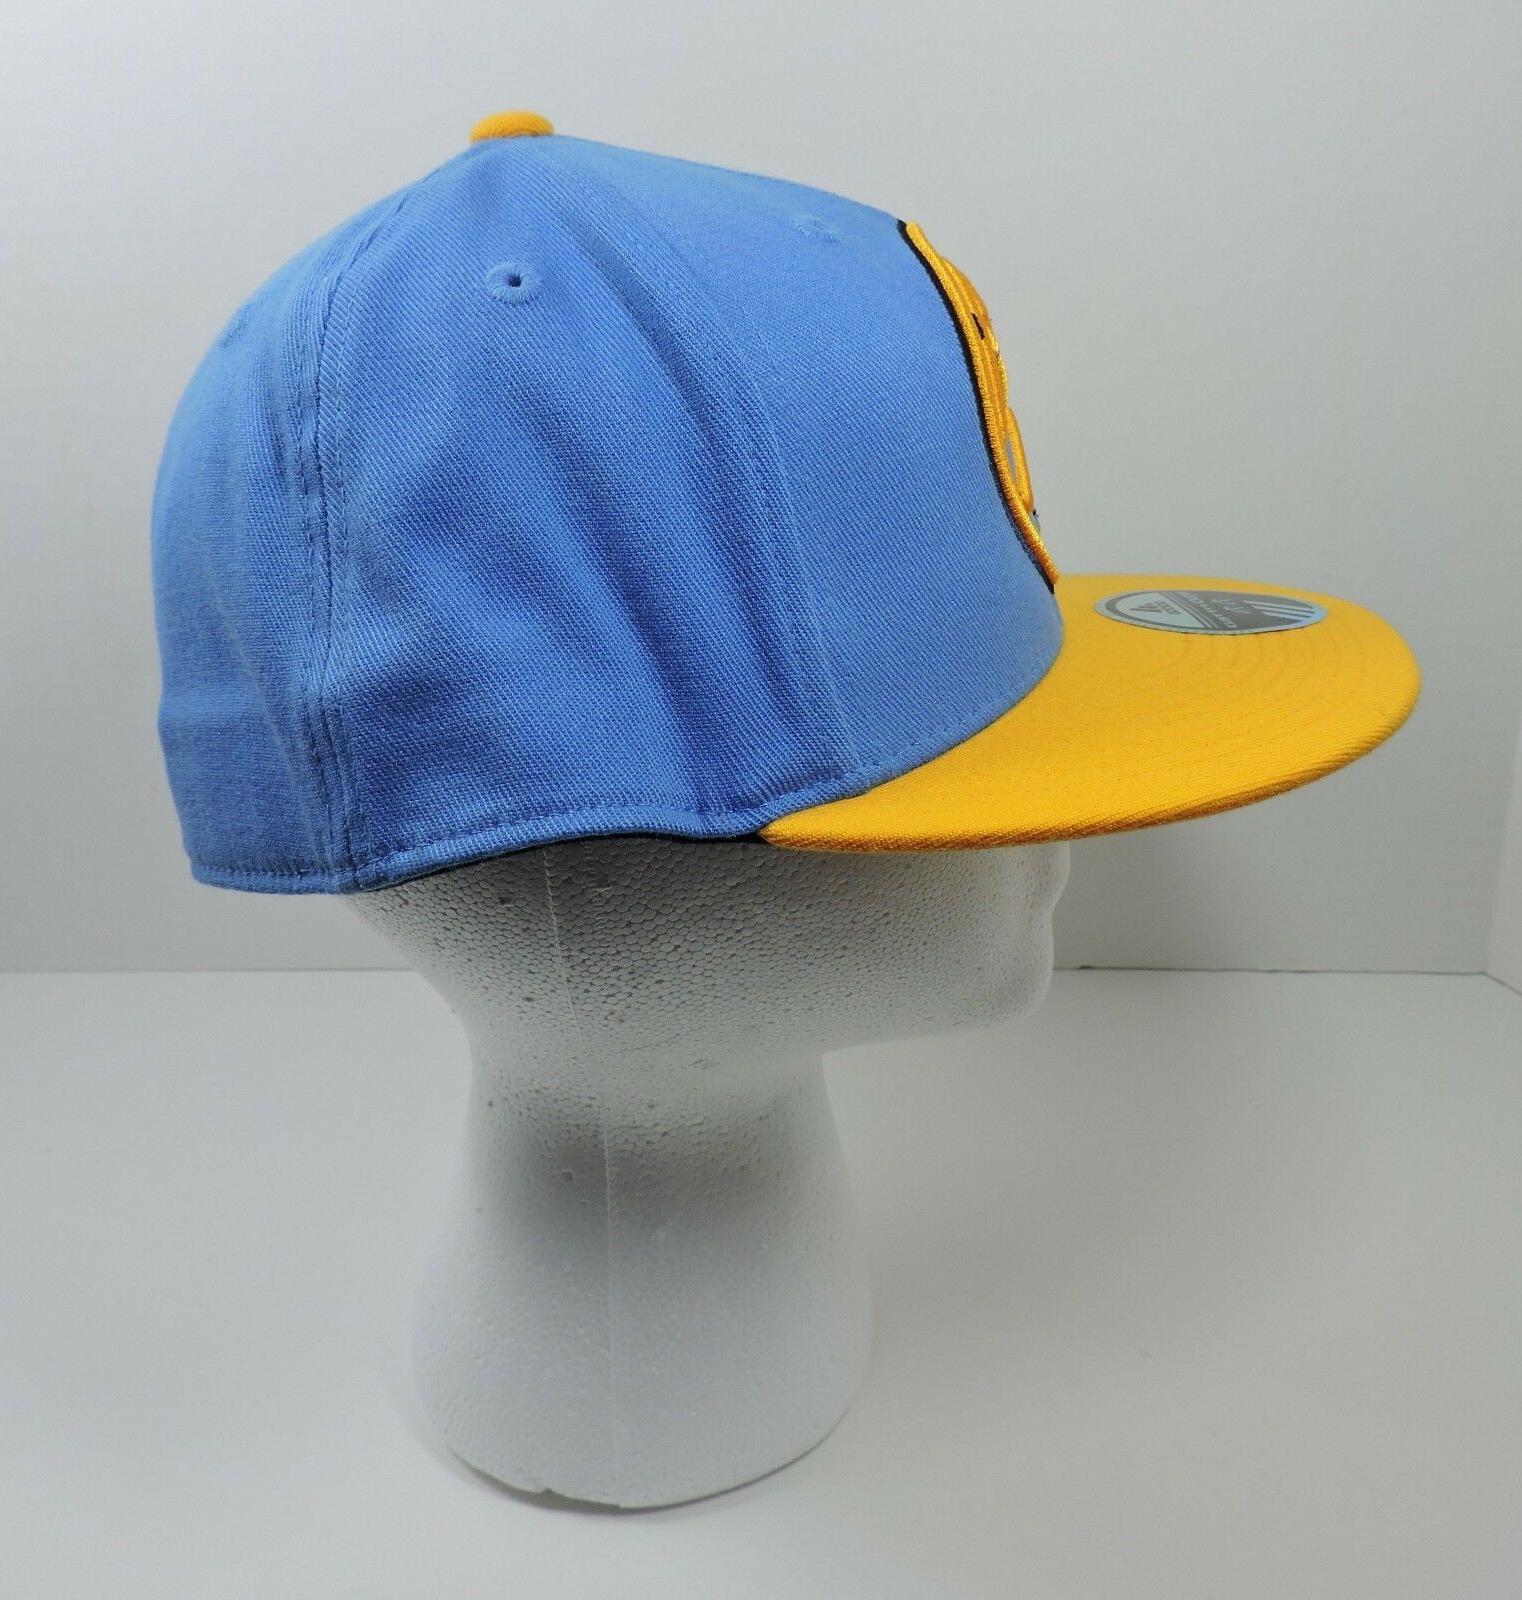 Adidas NBA Basketball Baseball Cap 7 1/4 5/8